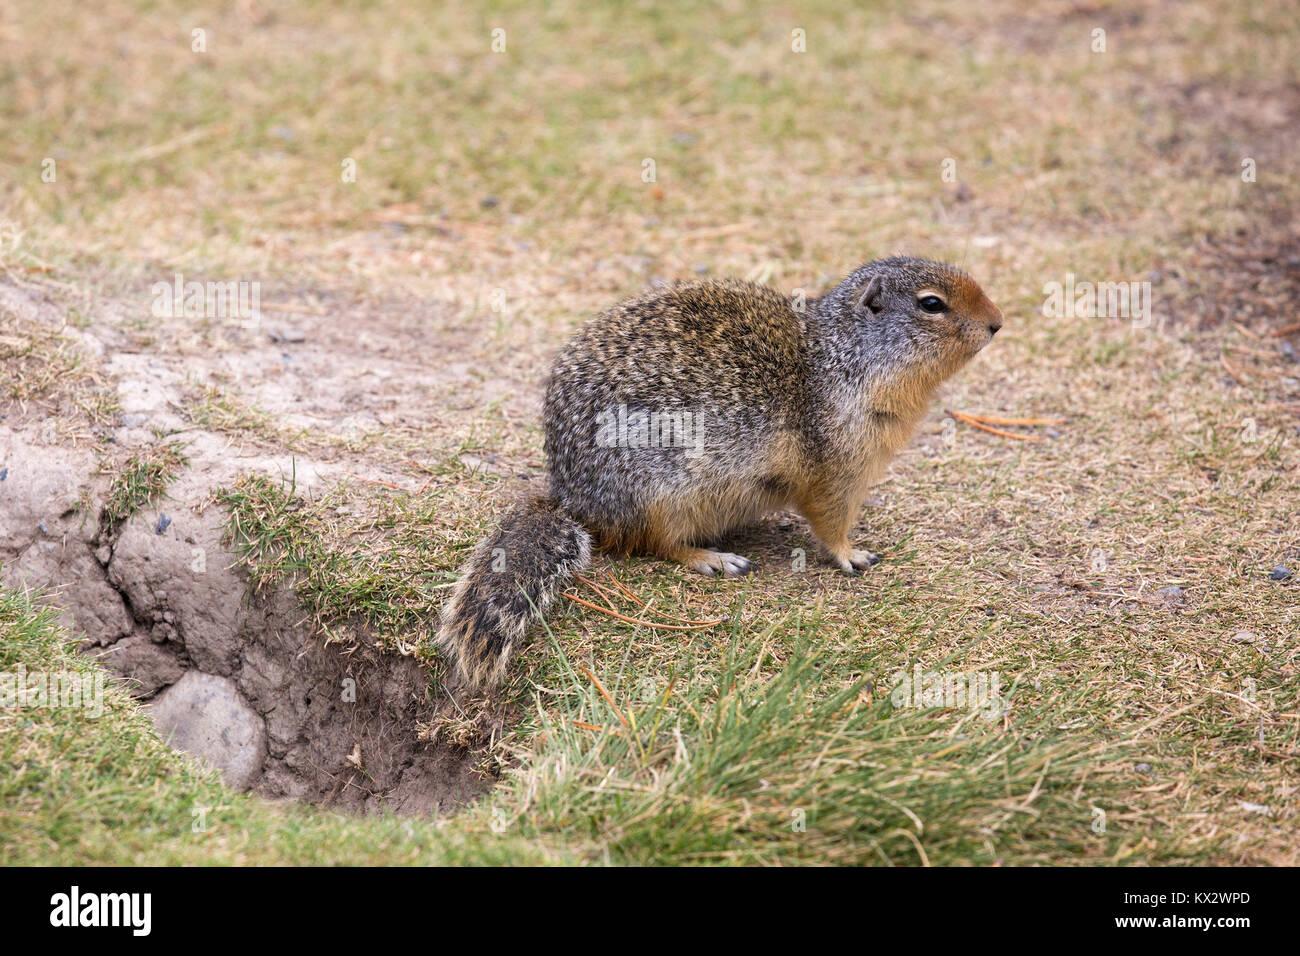 Columbian ground squirrel (Urocitellus columbianus) beside burrow in Banff National Park Stock Photo